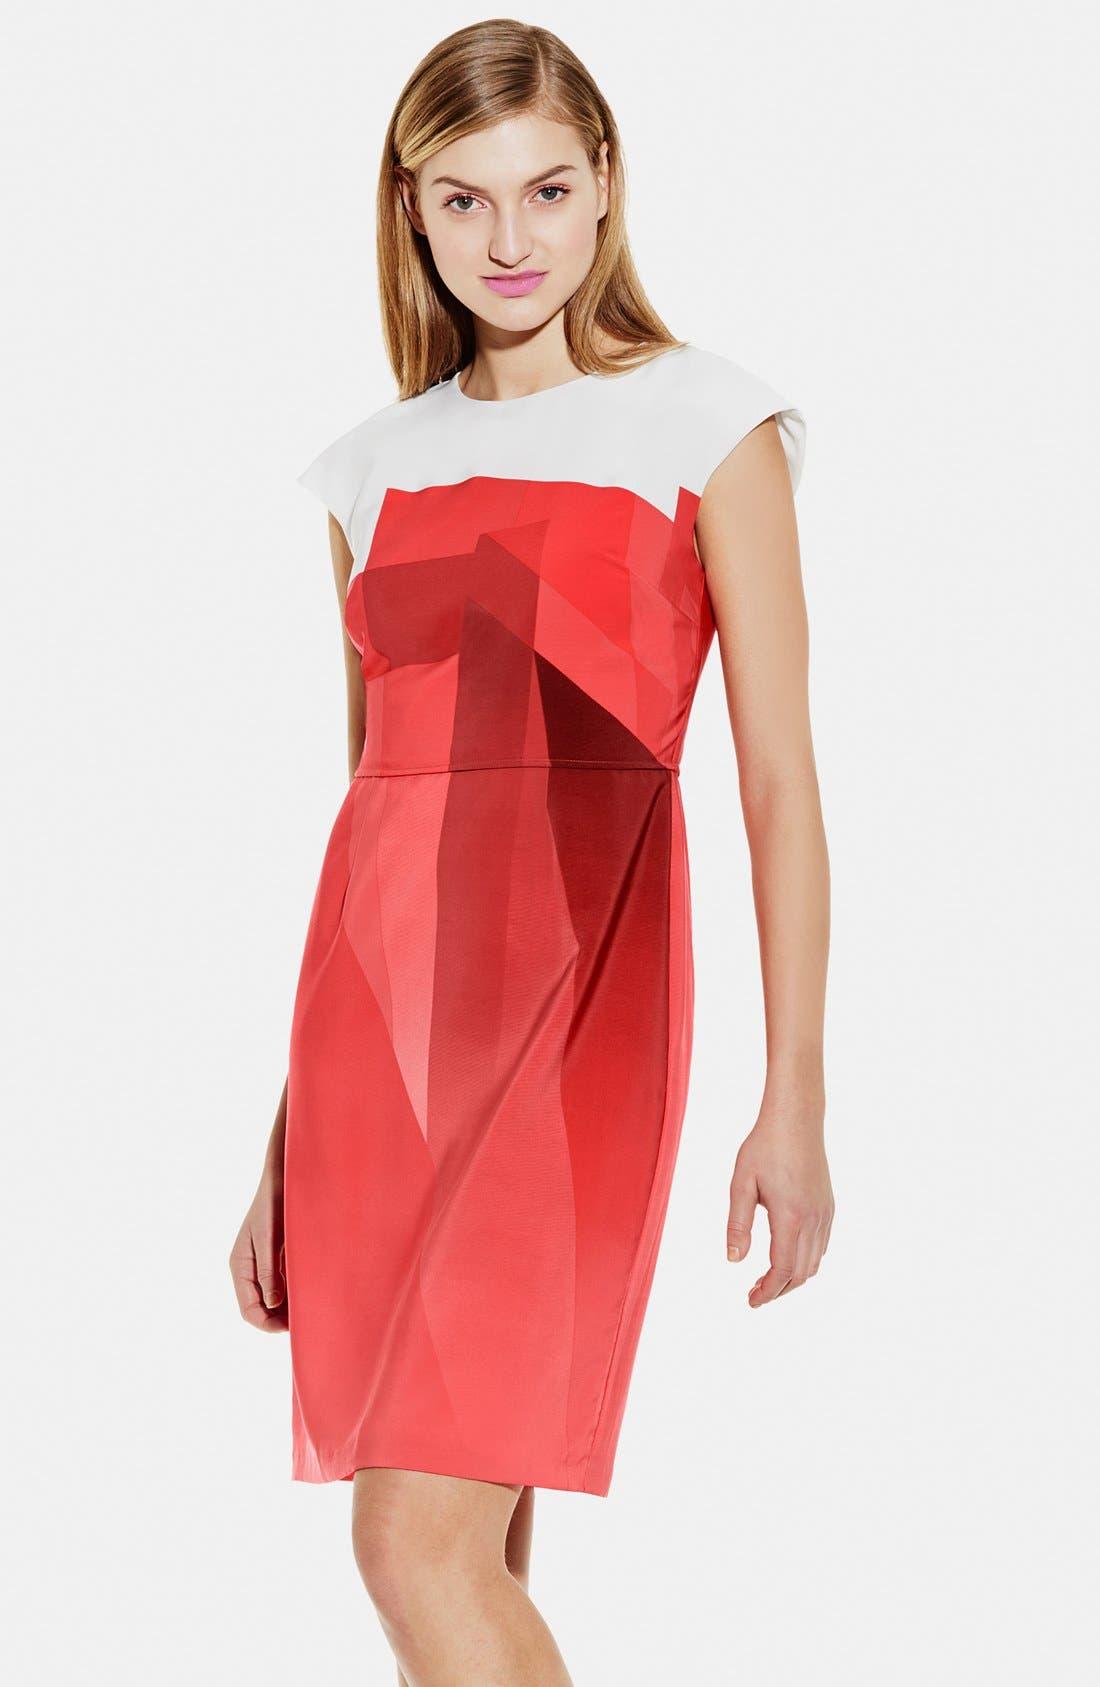 Main Image - Vince Camuto Contrast Yoke Ombré Print Sheath Dress (Regular & Petite)